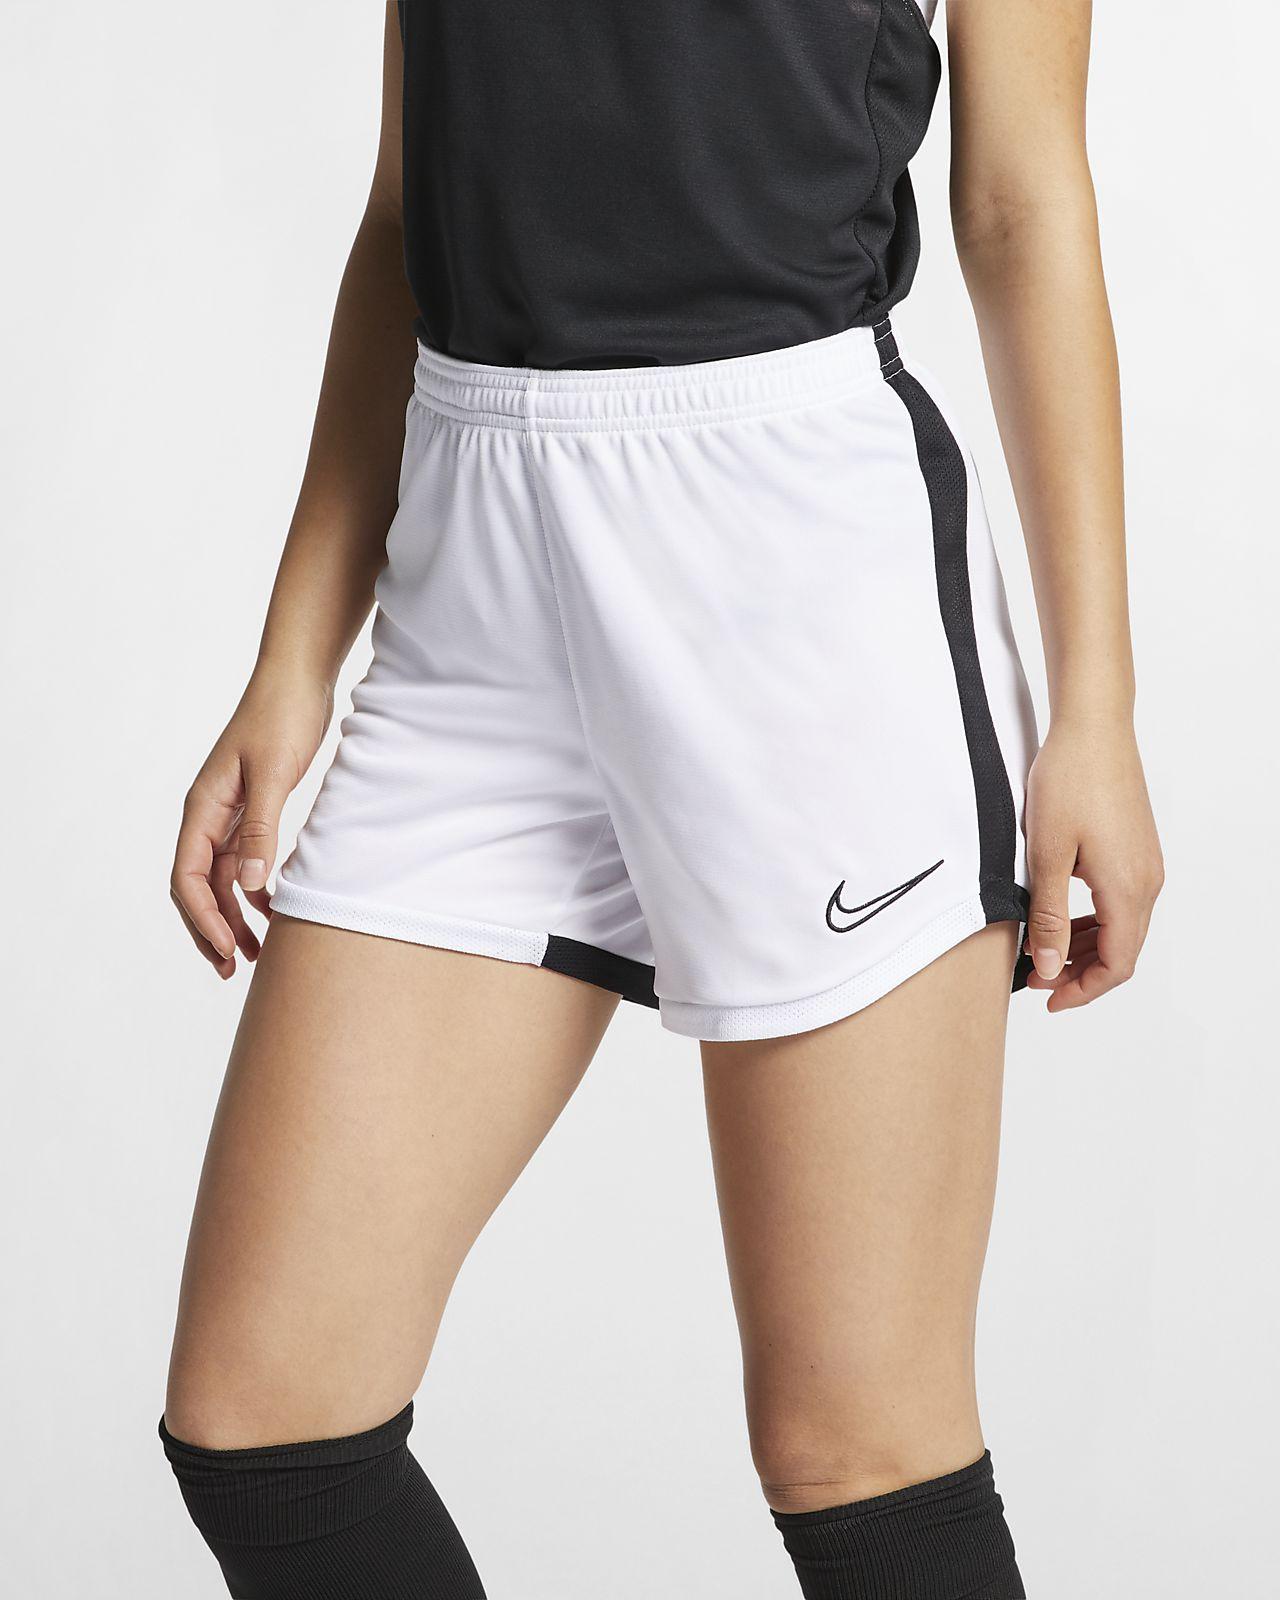 Nike Dri-FIT Academy fotballshorts til dame